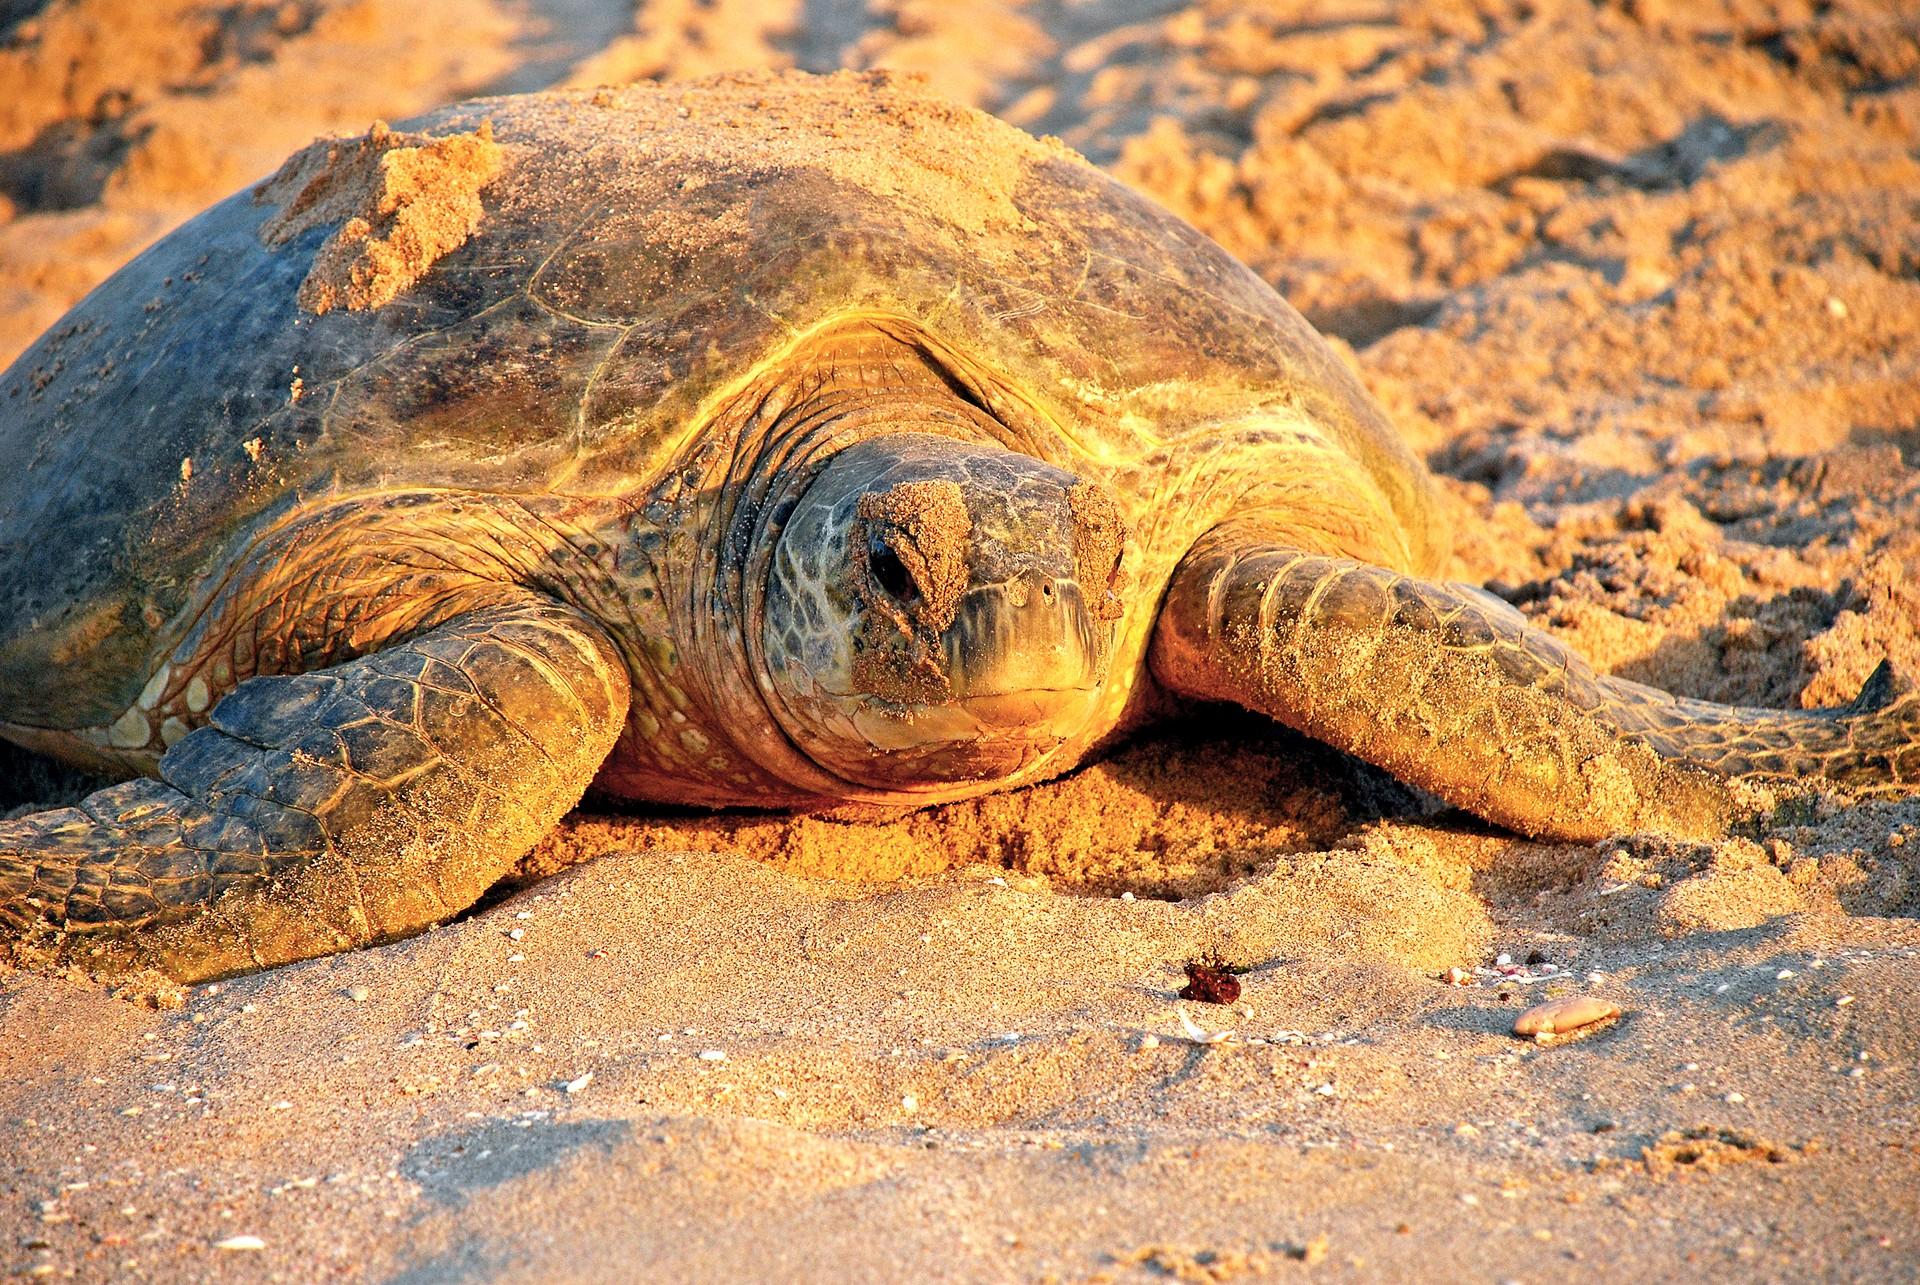 Turtle nesting in Oman